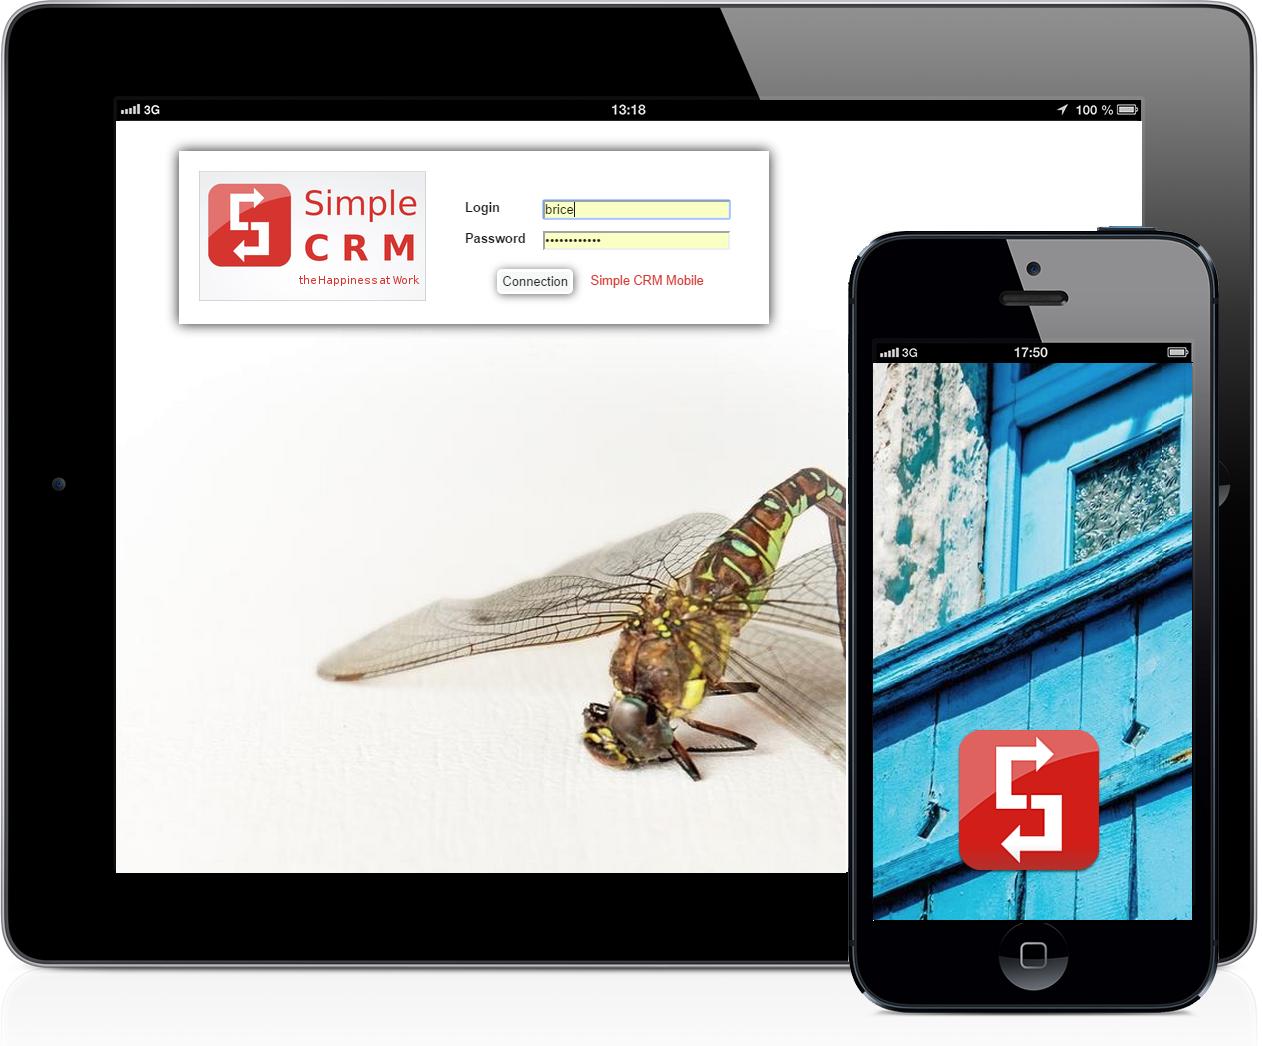 http://crm-pour-pme.fr/index.php/crm-compatbile-iphone-et-android